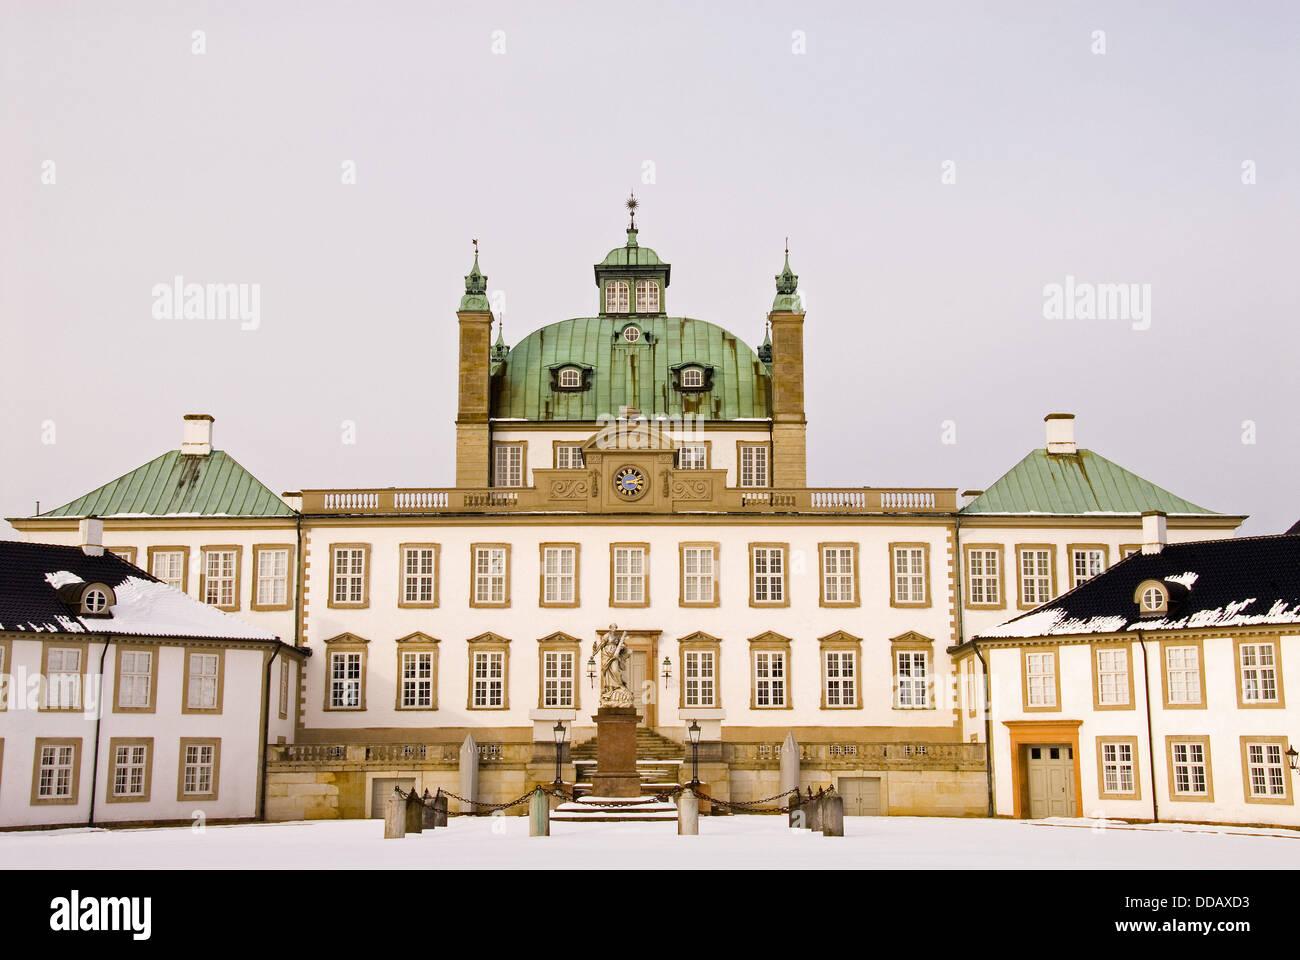 Fredensborg castle in Fredensborg Sealans, Denmark. Summer castle and summer residens to Her majesty Queen Margrethe - Stock Image